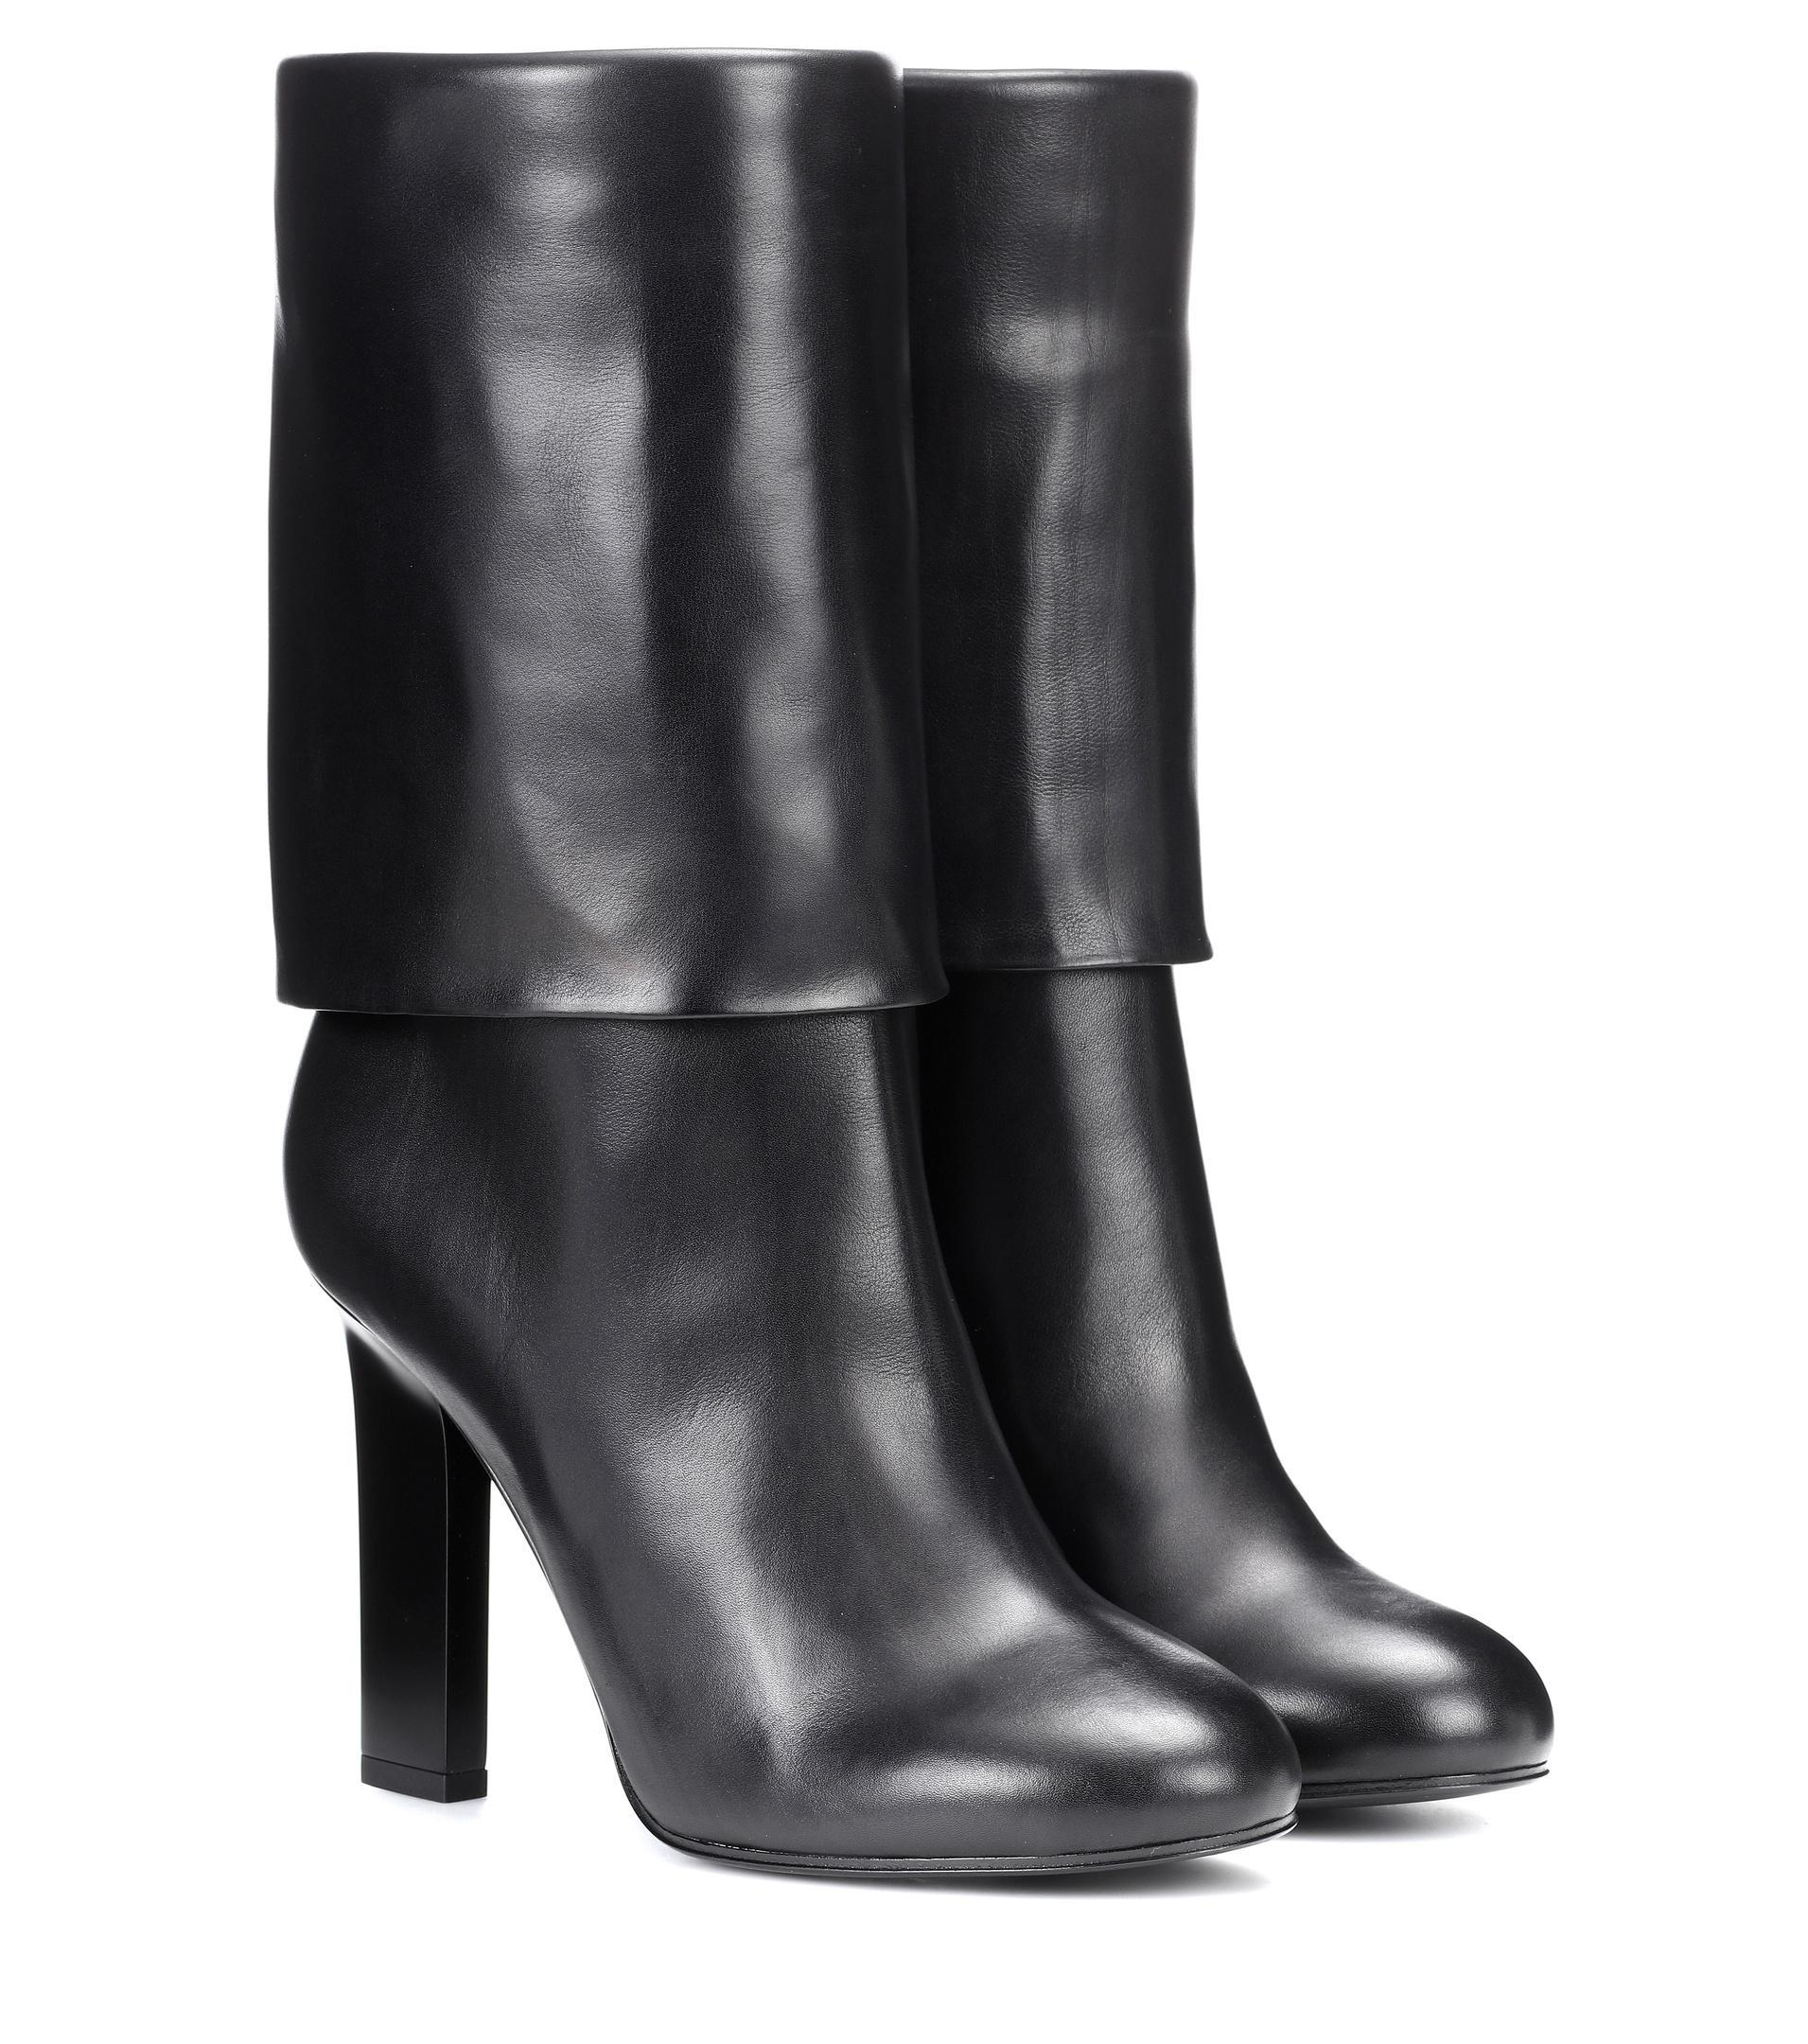 lyst victoria beckham leather ankle boots in black. Black Bedroom Furniture Sets. Home Design Ideas